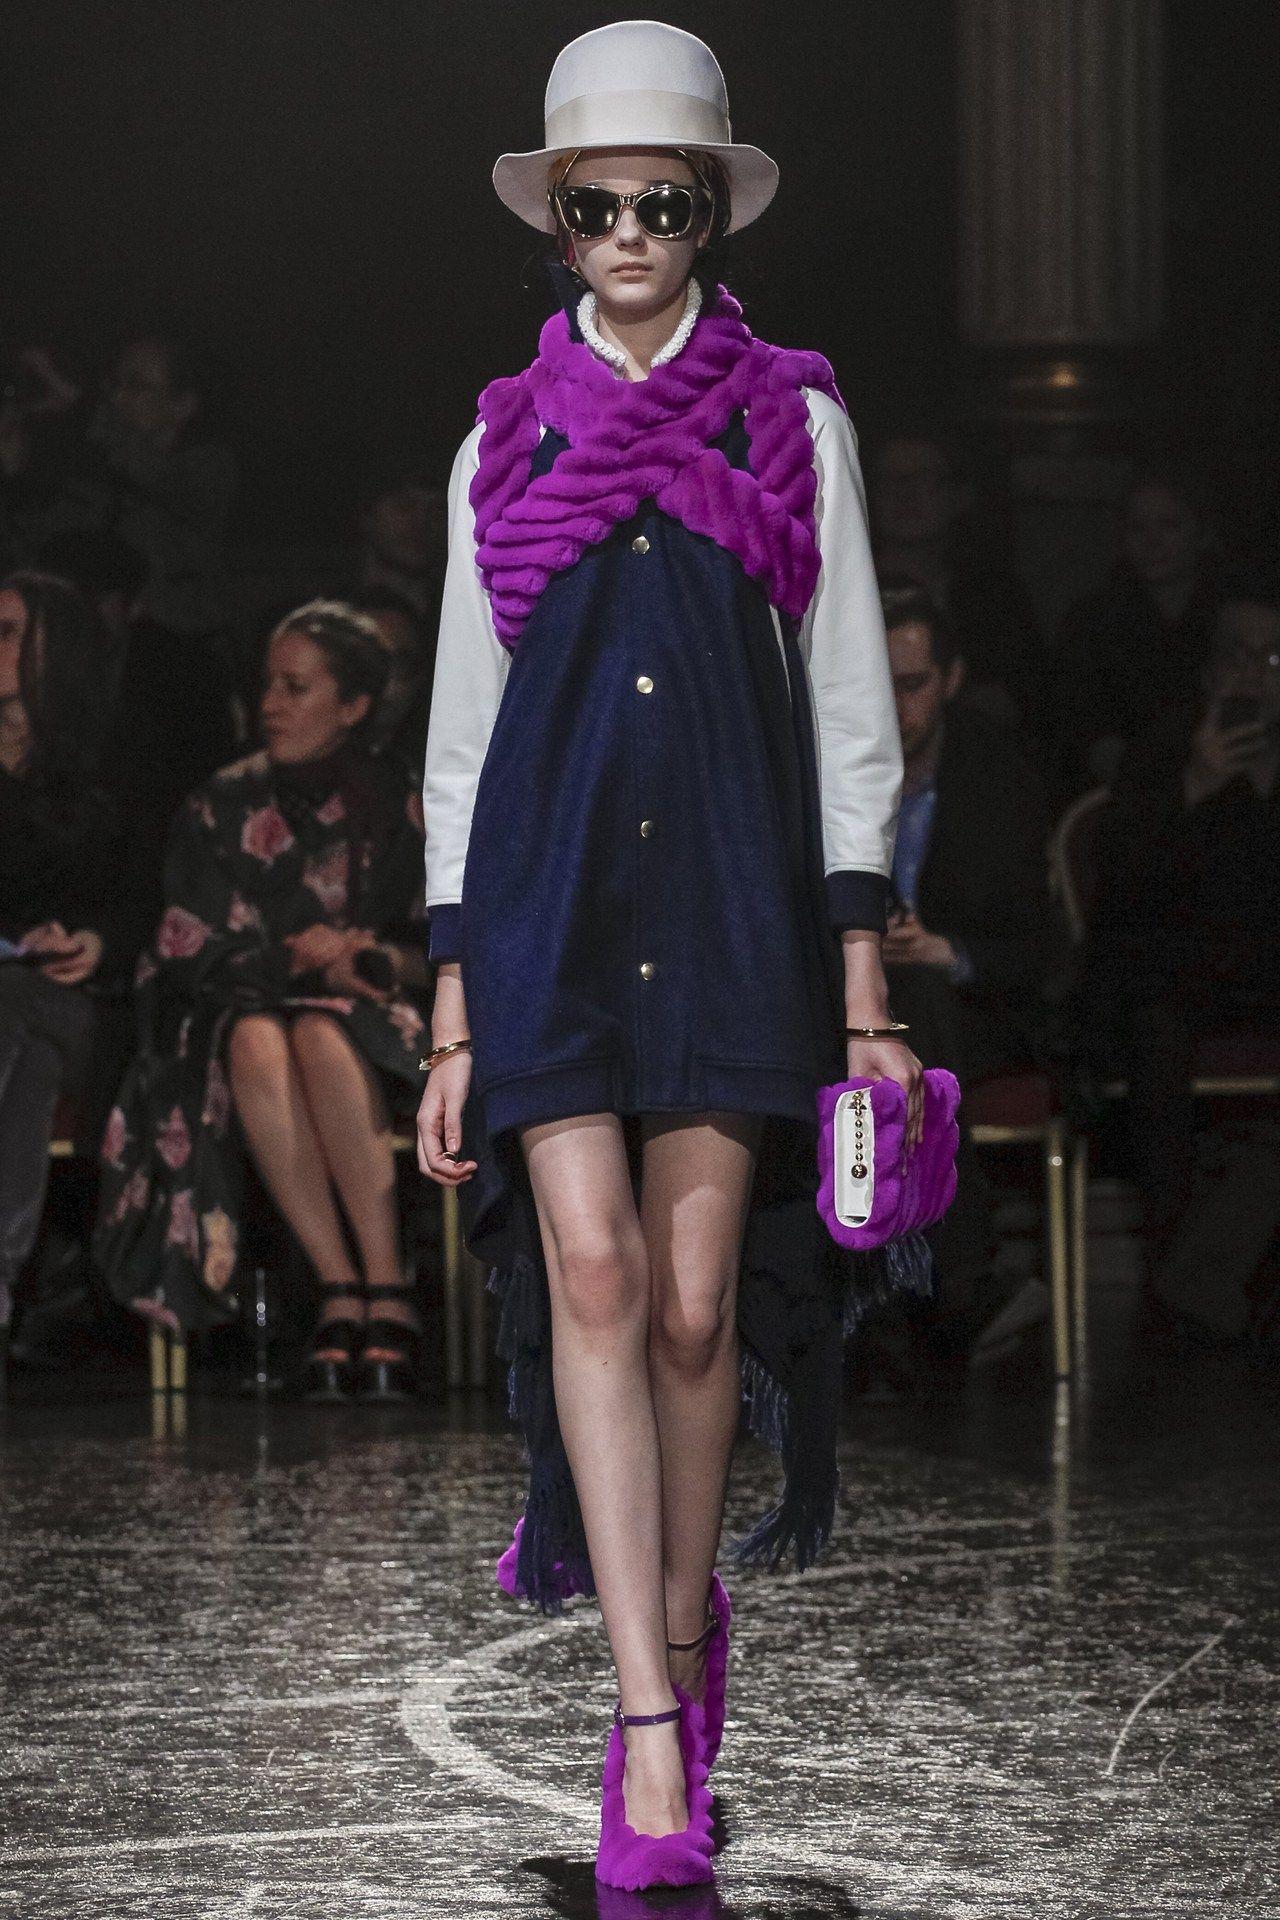 Undercover fashion collection, autumn/winter 2014 -- plum / purple